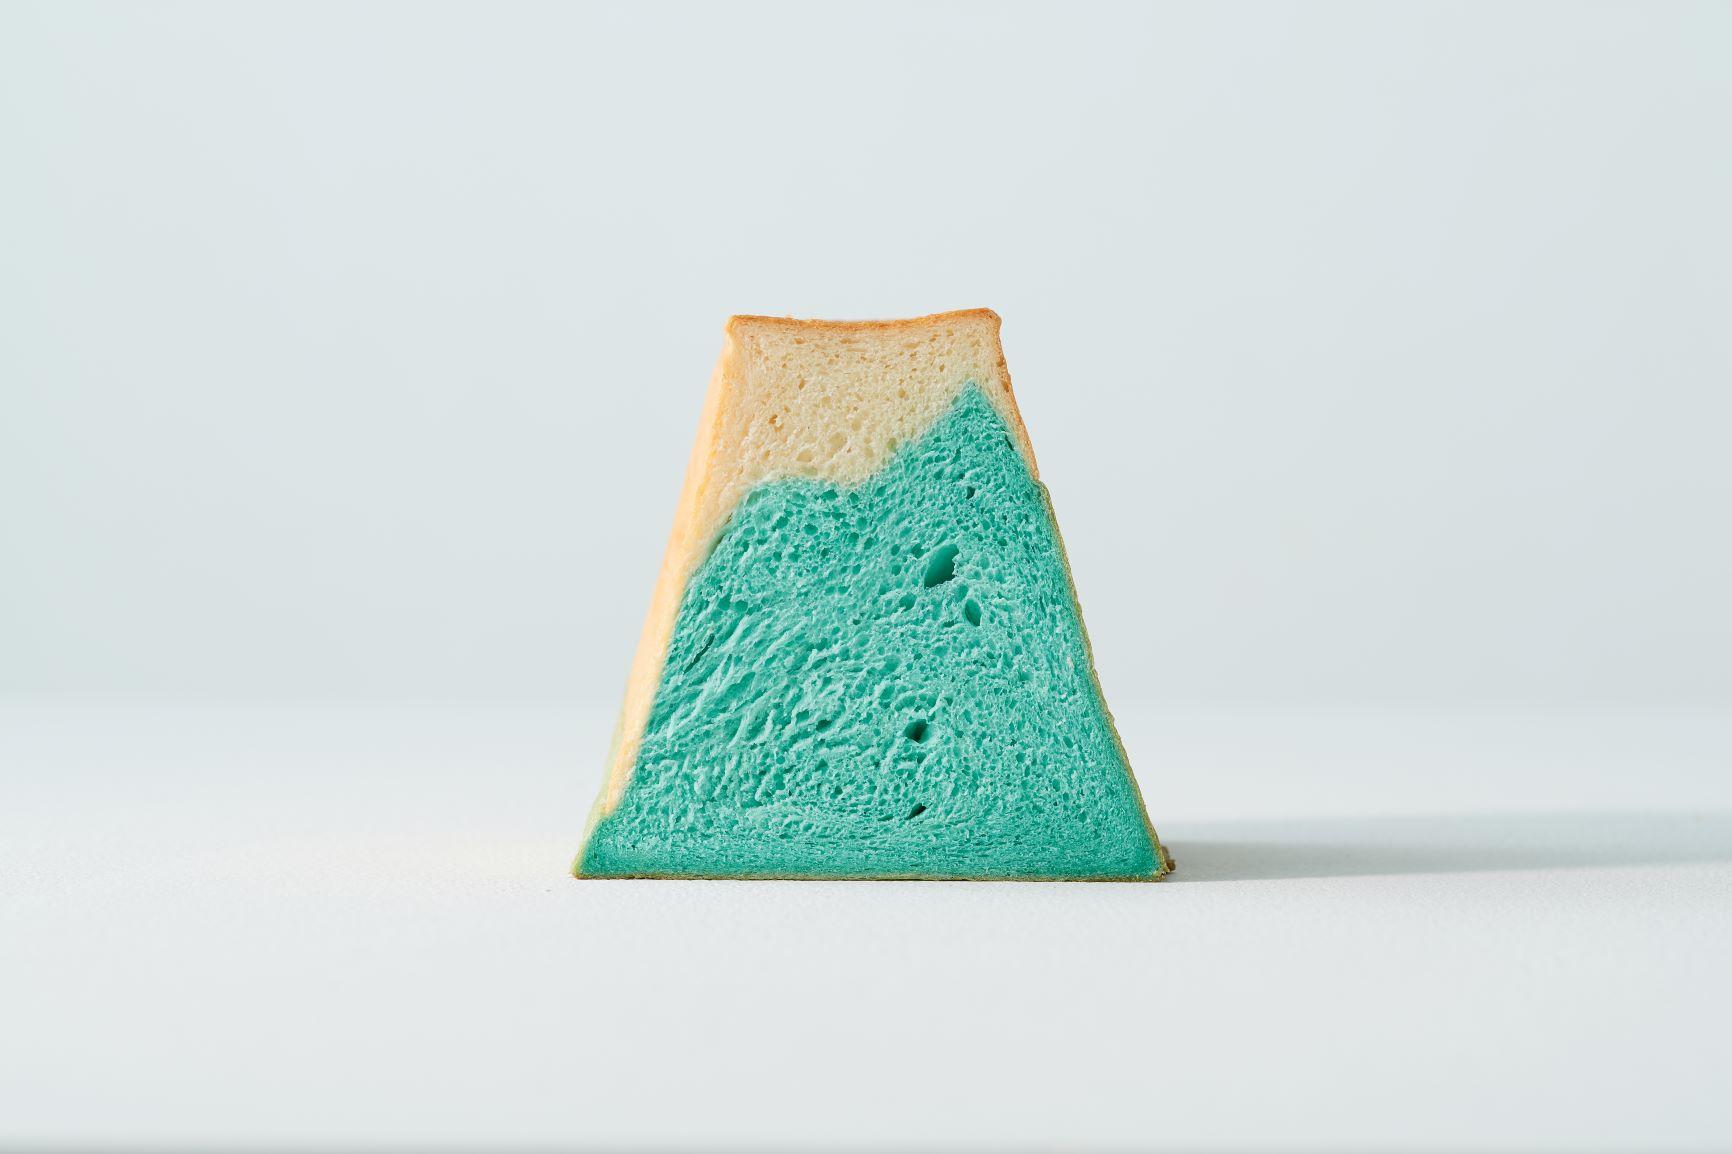 FUJISAN SHOKUPAN Mount Fuji Bread 富士山麵包